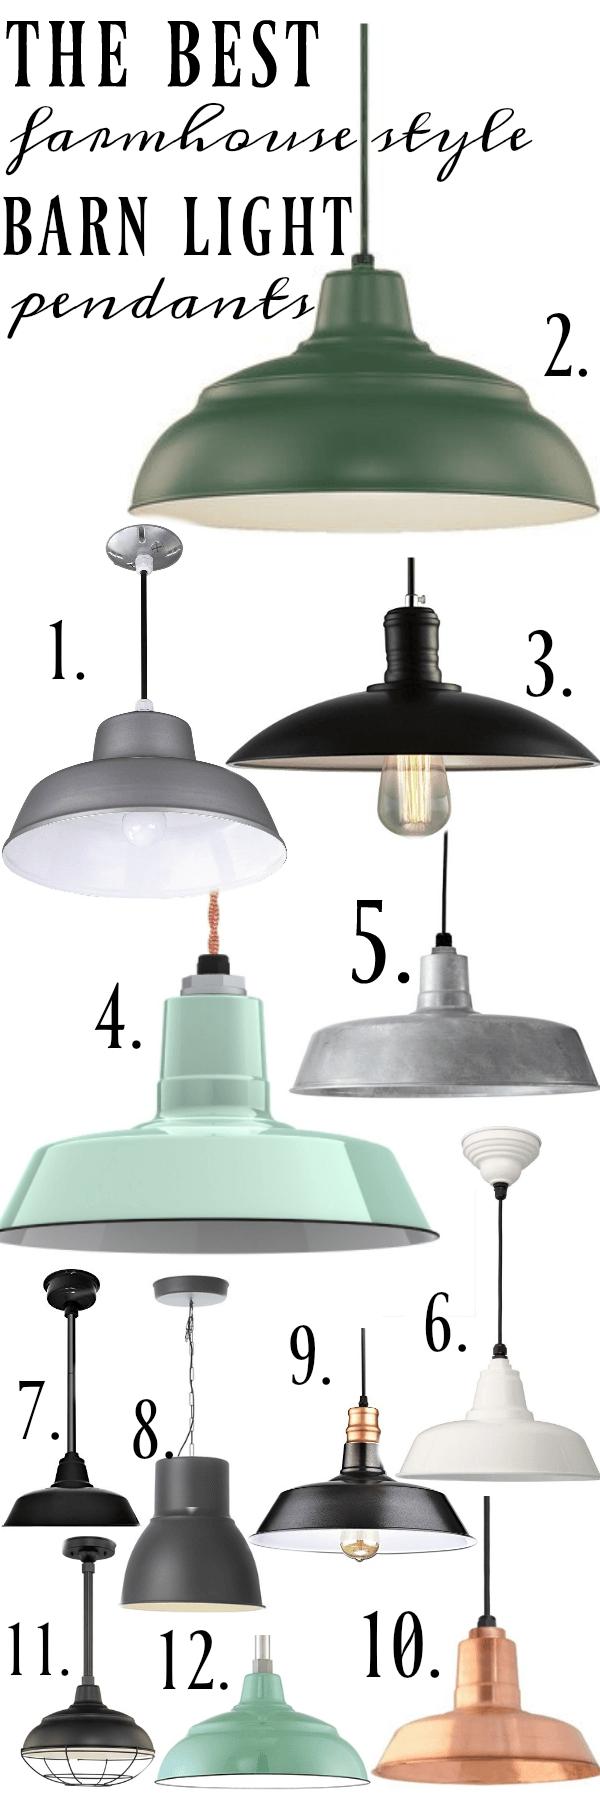 Farmhouse Barn Light Pendants | Farmhouse Style, Cottage Style And Regarding Outdoor Hanging Barn Lights (#6 of 15)